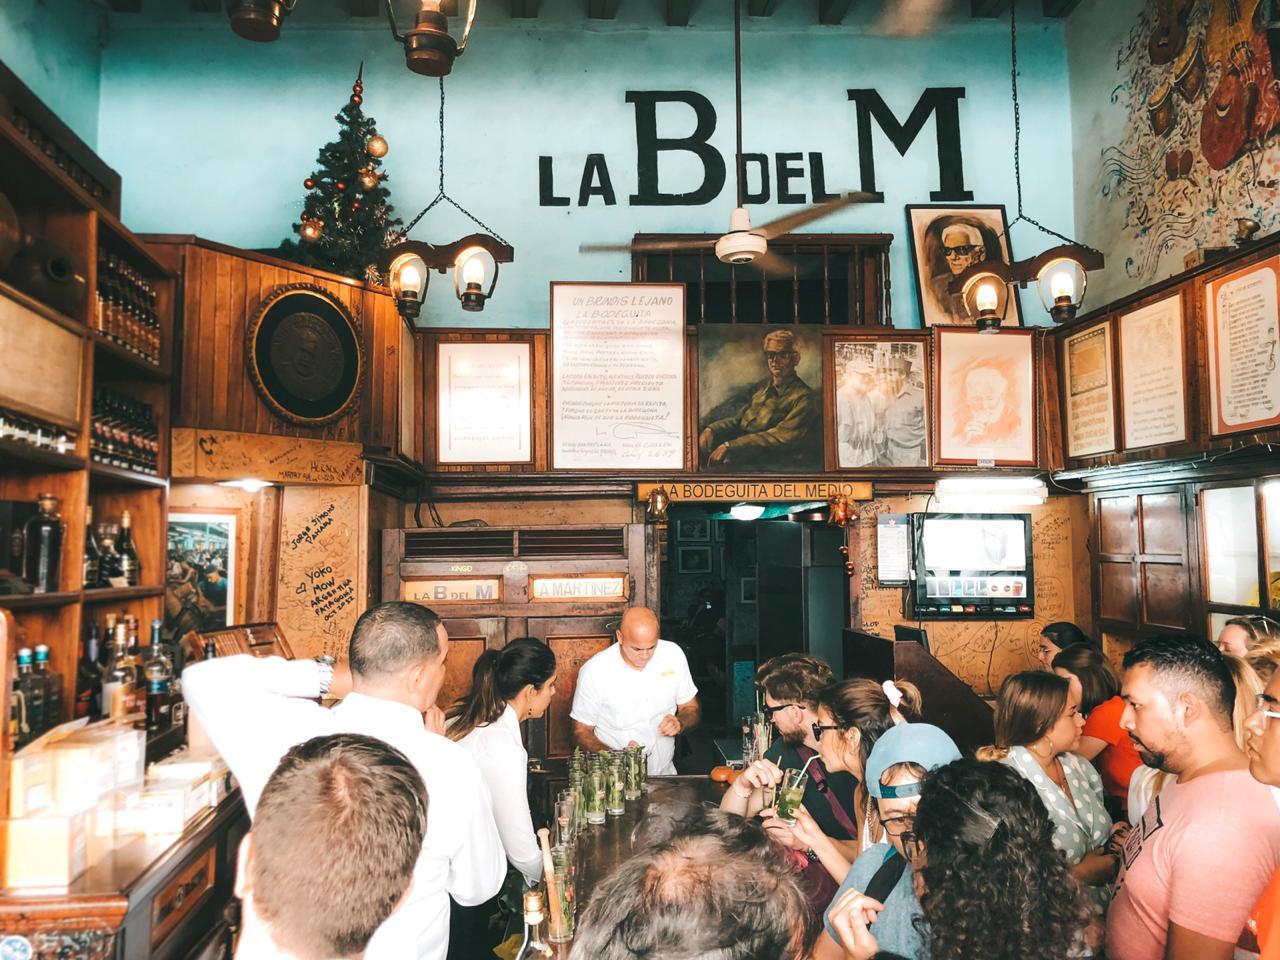 La Bodeguita del Medio, em Havana, Cuba (Foto: Tati Sisti)